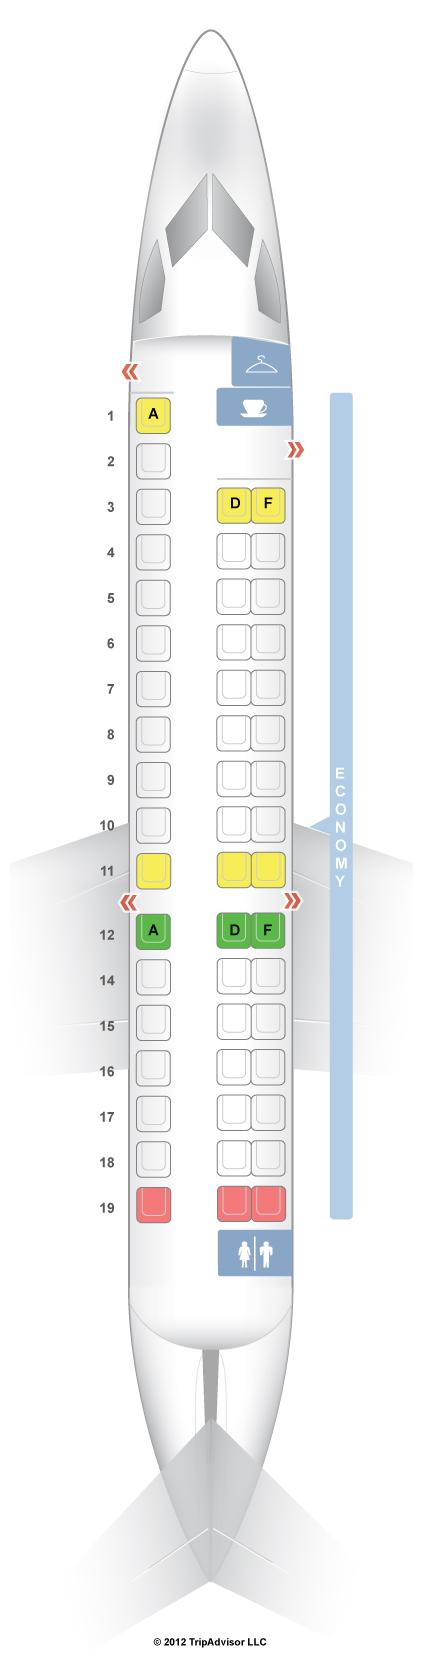 Seatguru Seat Map Air France Embraer Erj 145